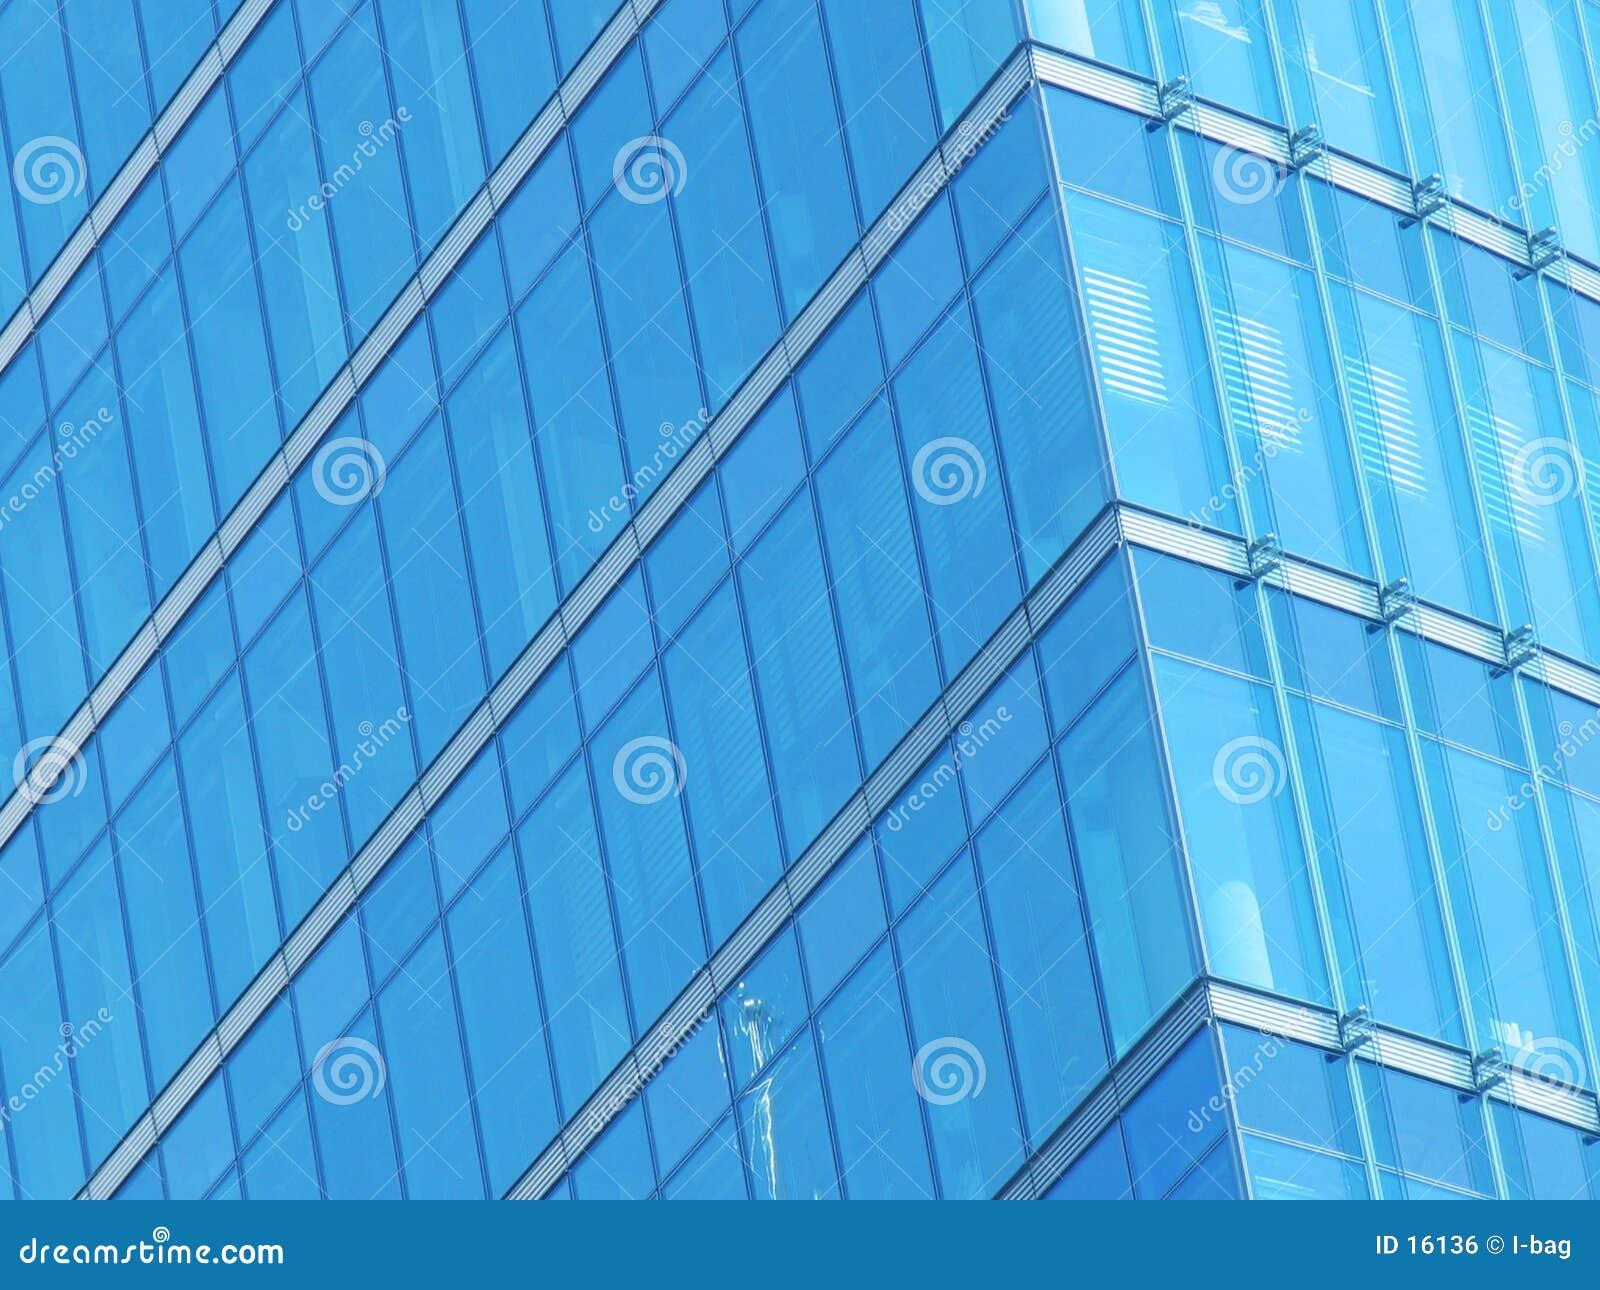 Blue building glass facade